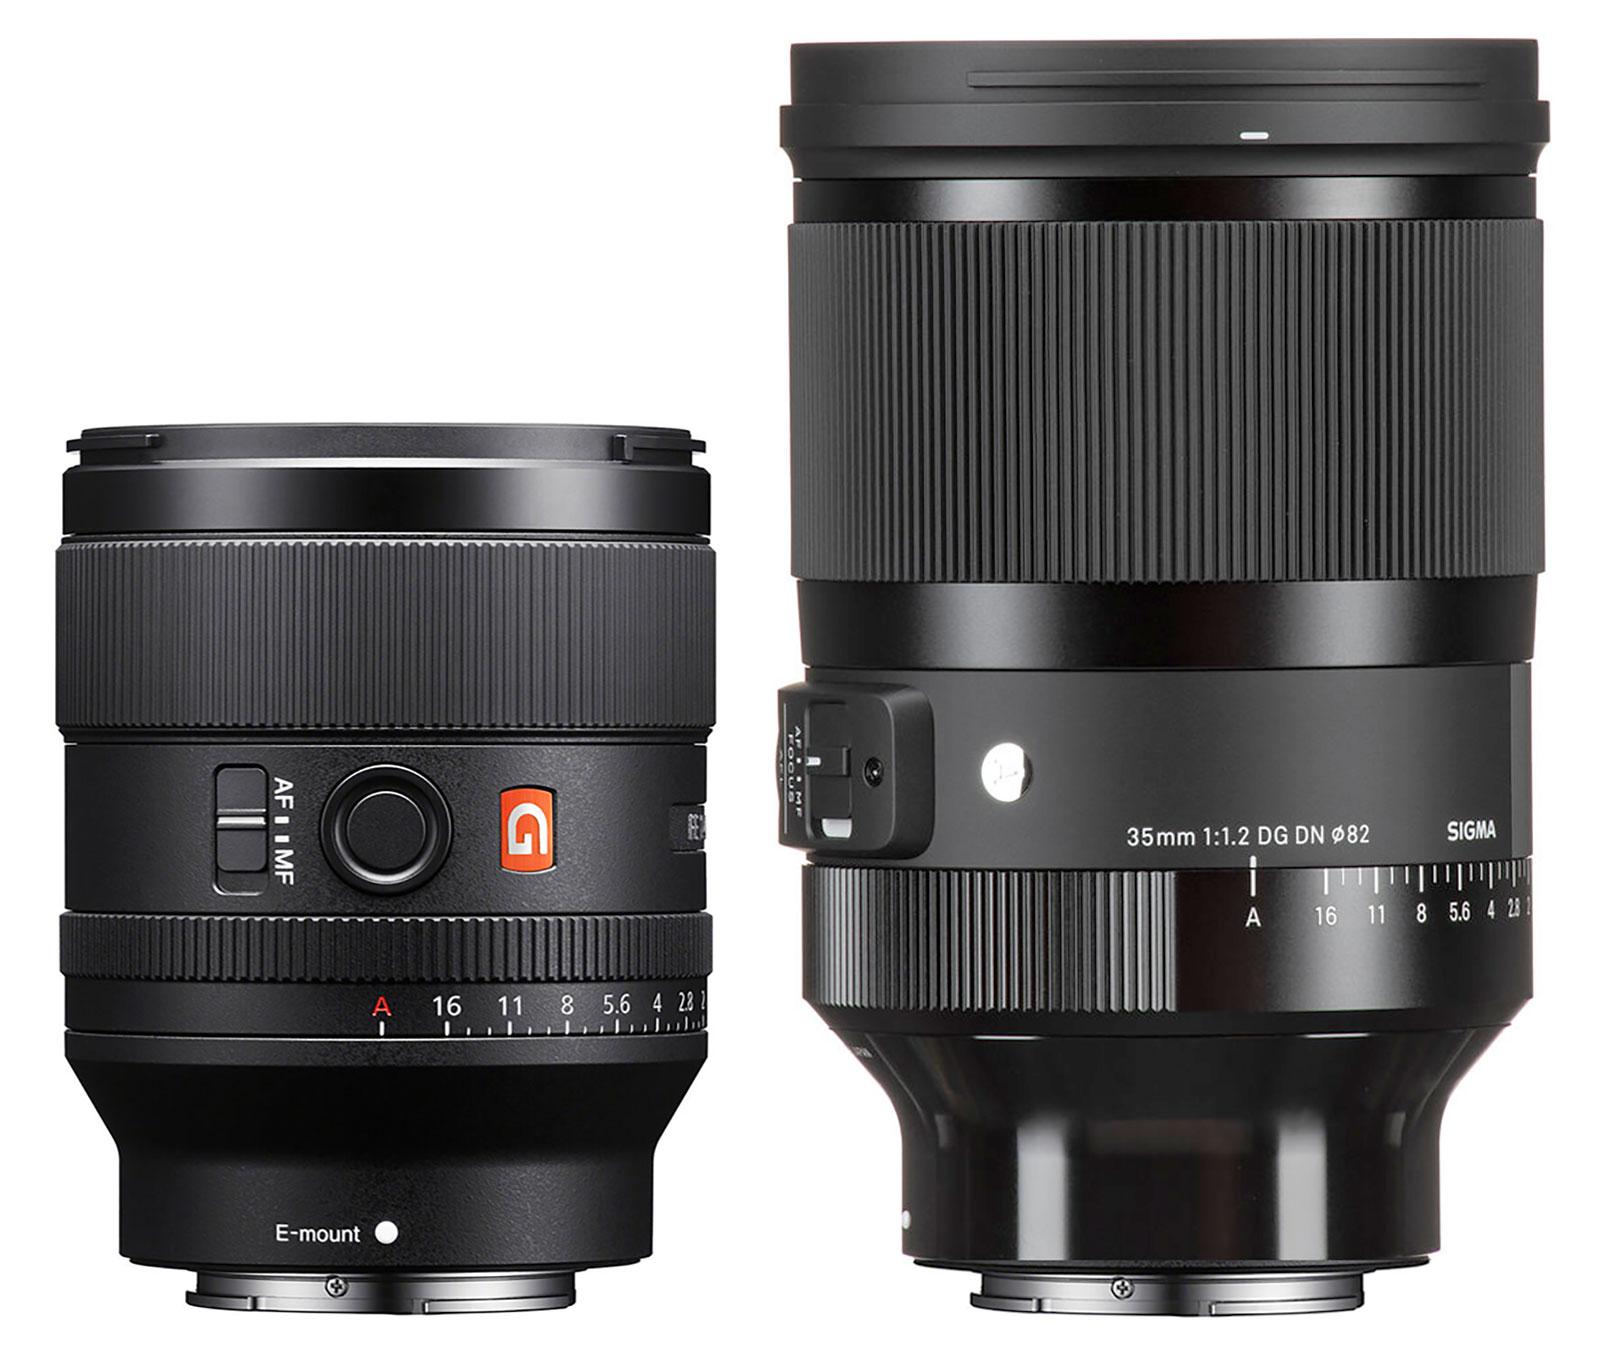 Sony FE 35mm f/1.4 GM -vs- Sigma 35mm f/1.2 DG DN Art